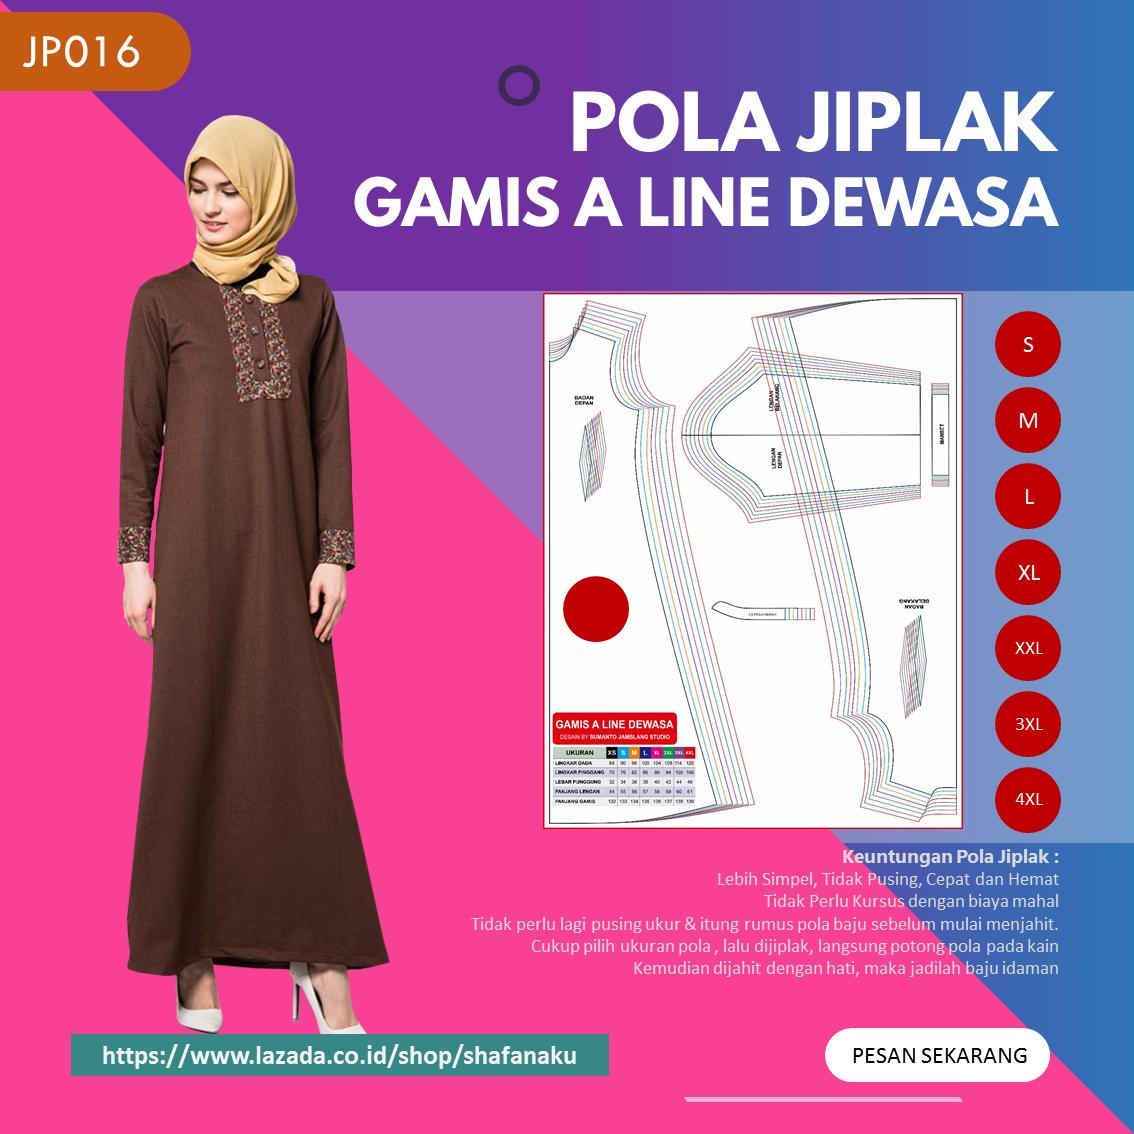 Pola Jiplak Gamis A Line Dewasa 8 In 1 Jp016 Lazada Indonesia